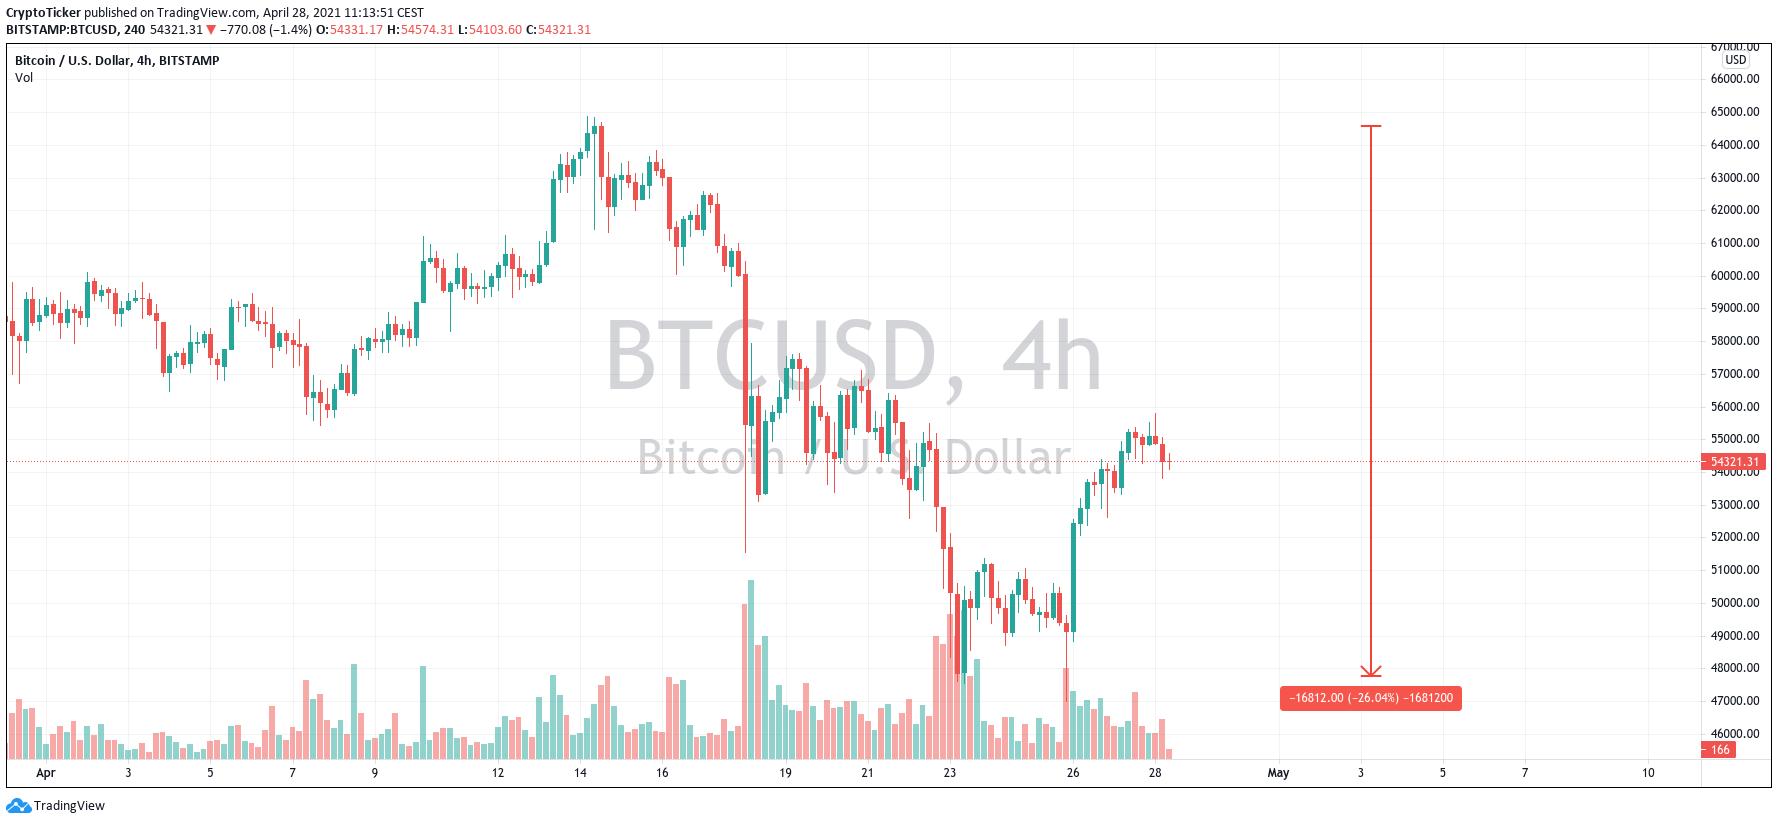 BTC/USD 4-hour chart showing the crash that happened last week